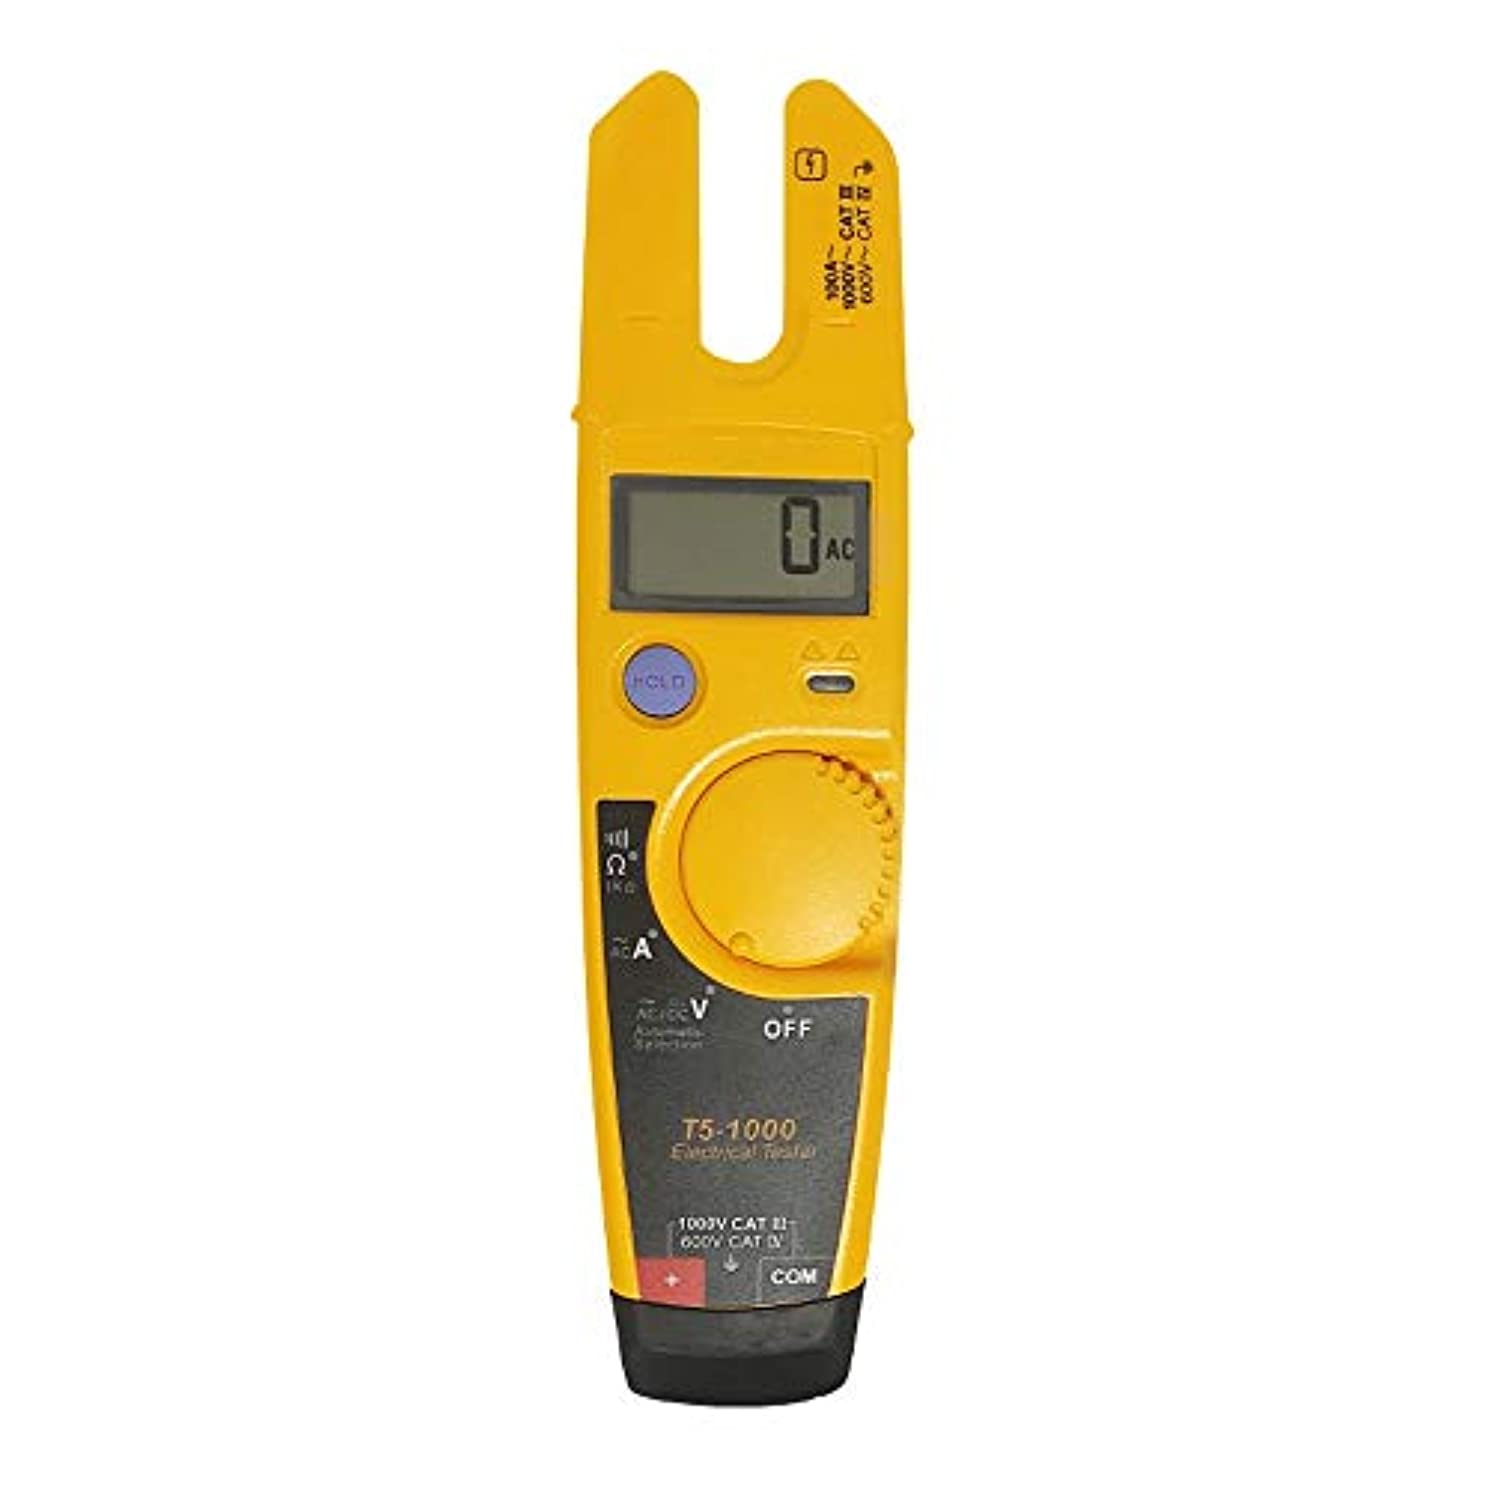 TDHHY Labloot ソフトケース付き T5-600 クランプメーター 電圧 連続電流 クランプメーター